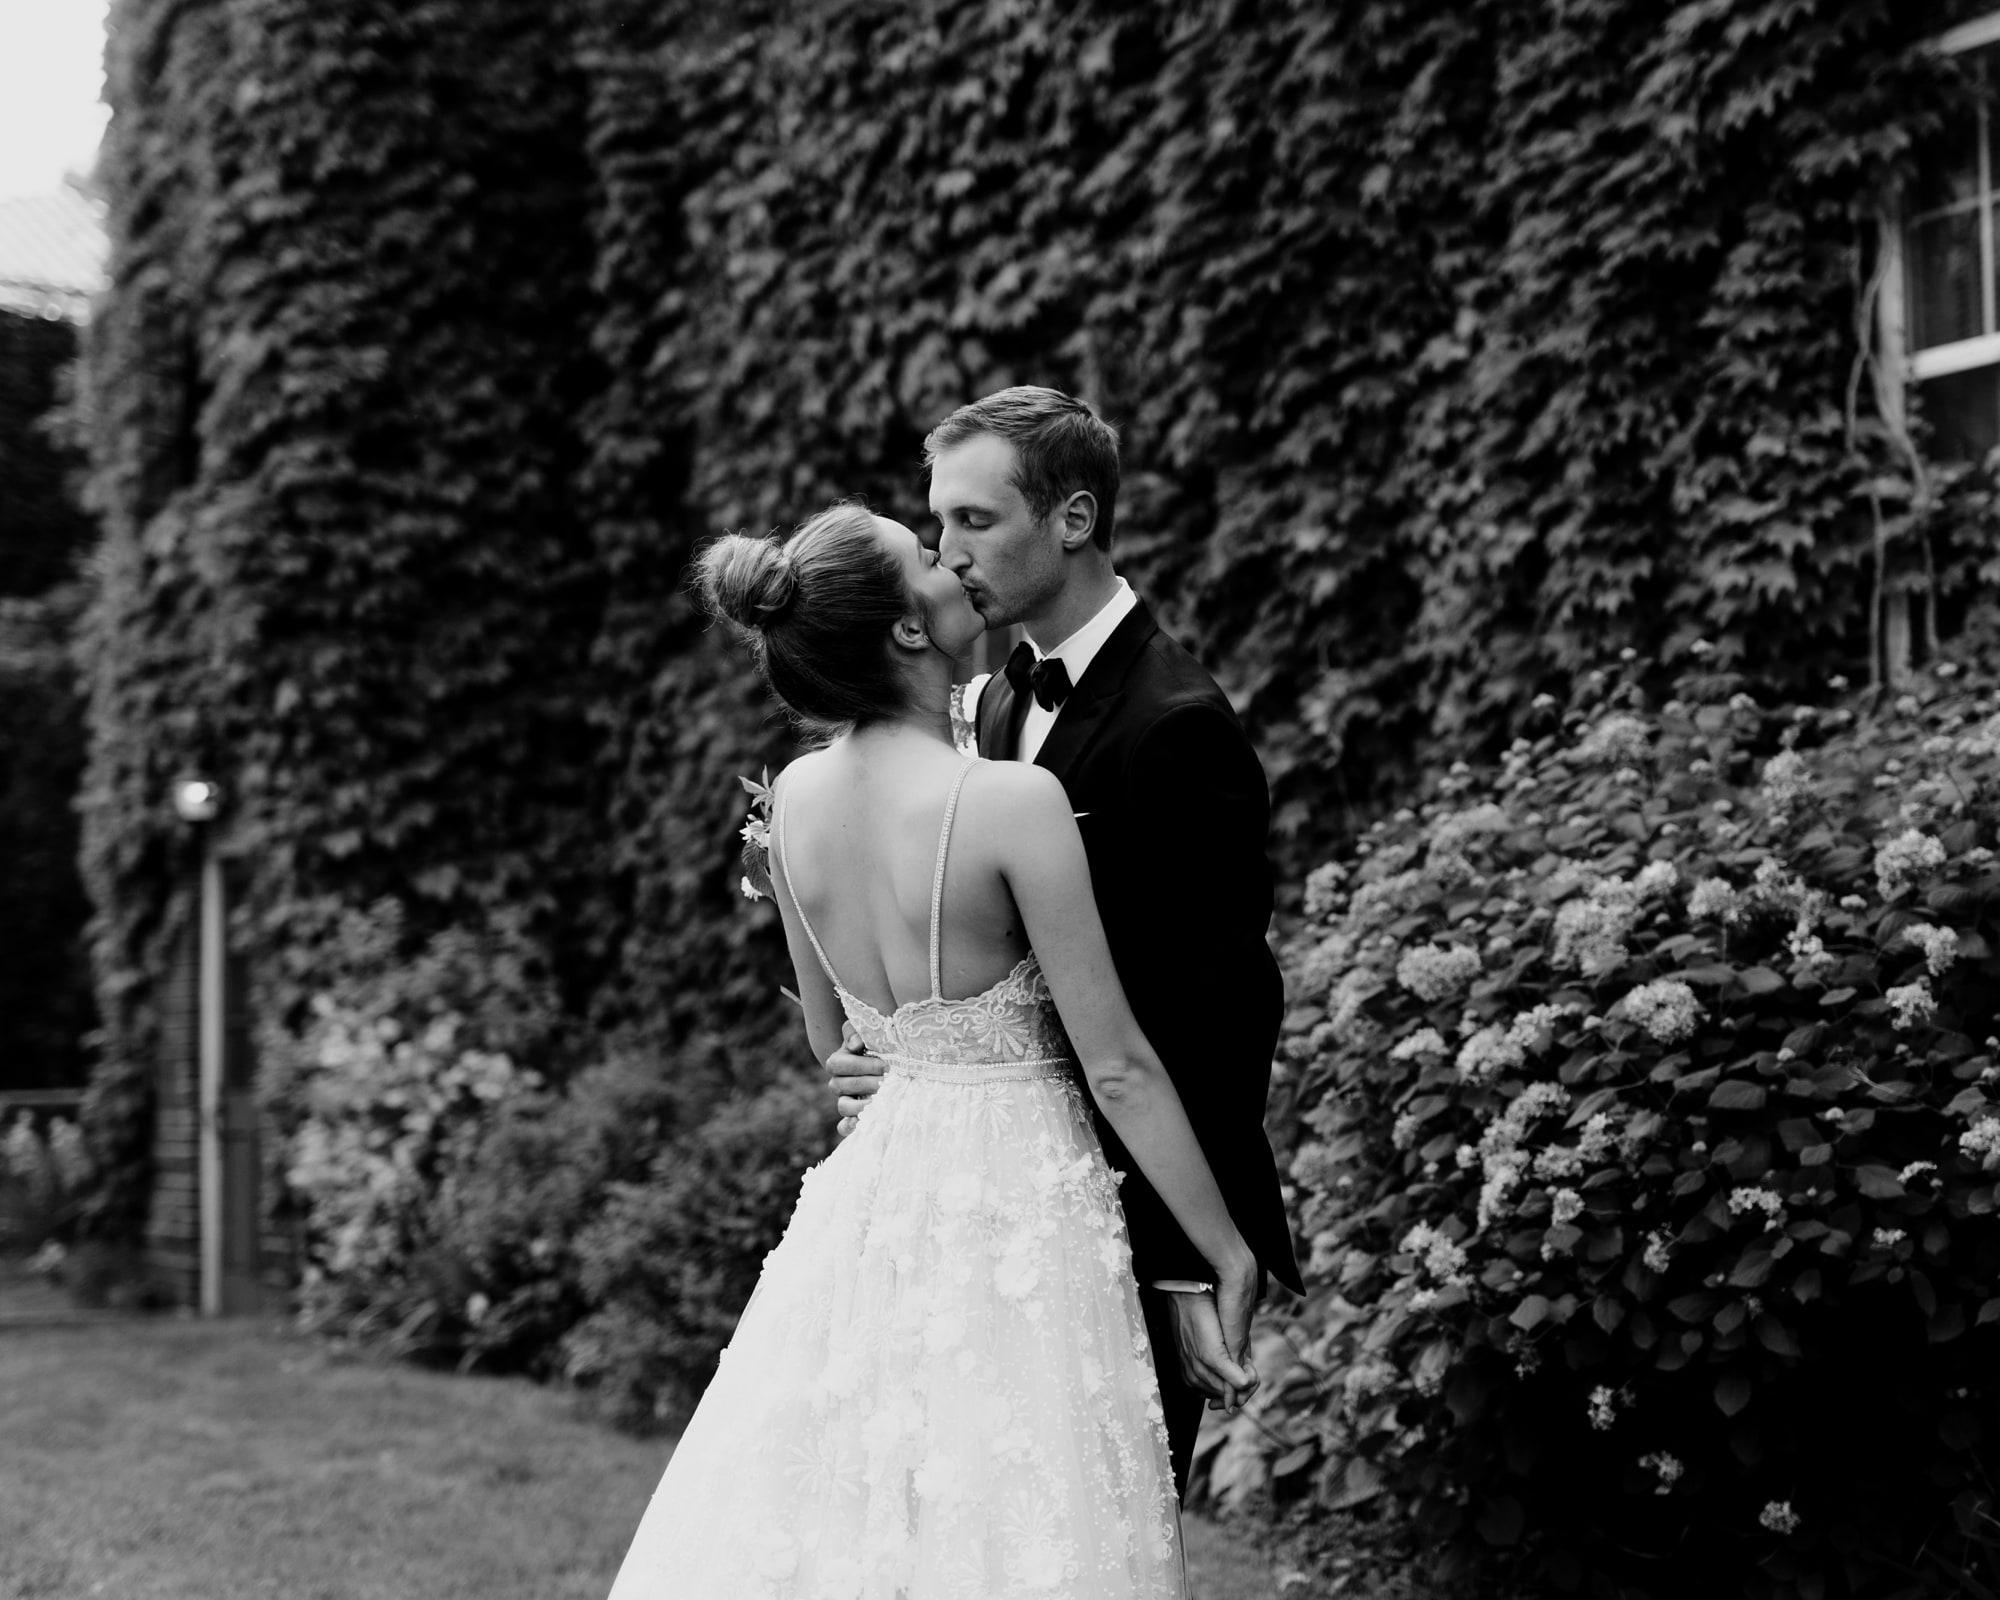 MIA-Minneapolis-Institute-Art-Summer-Wedding-_21.jpg